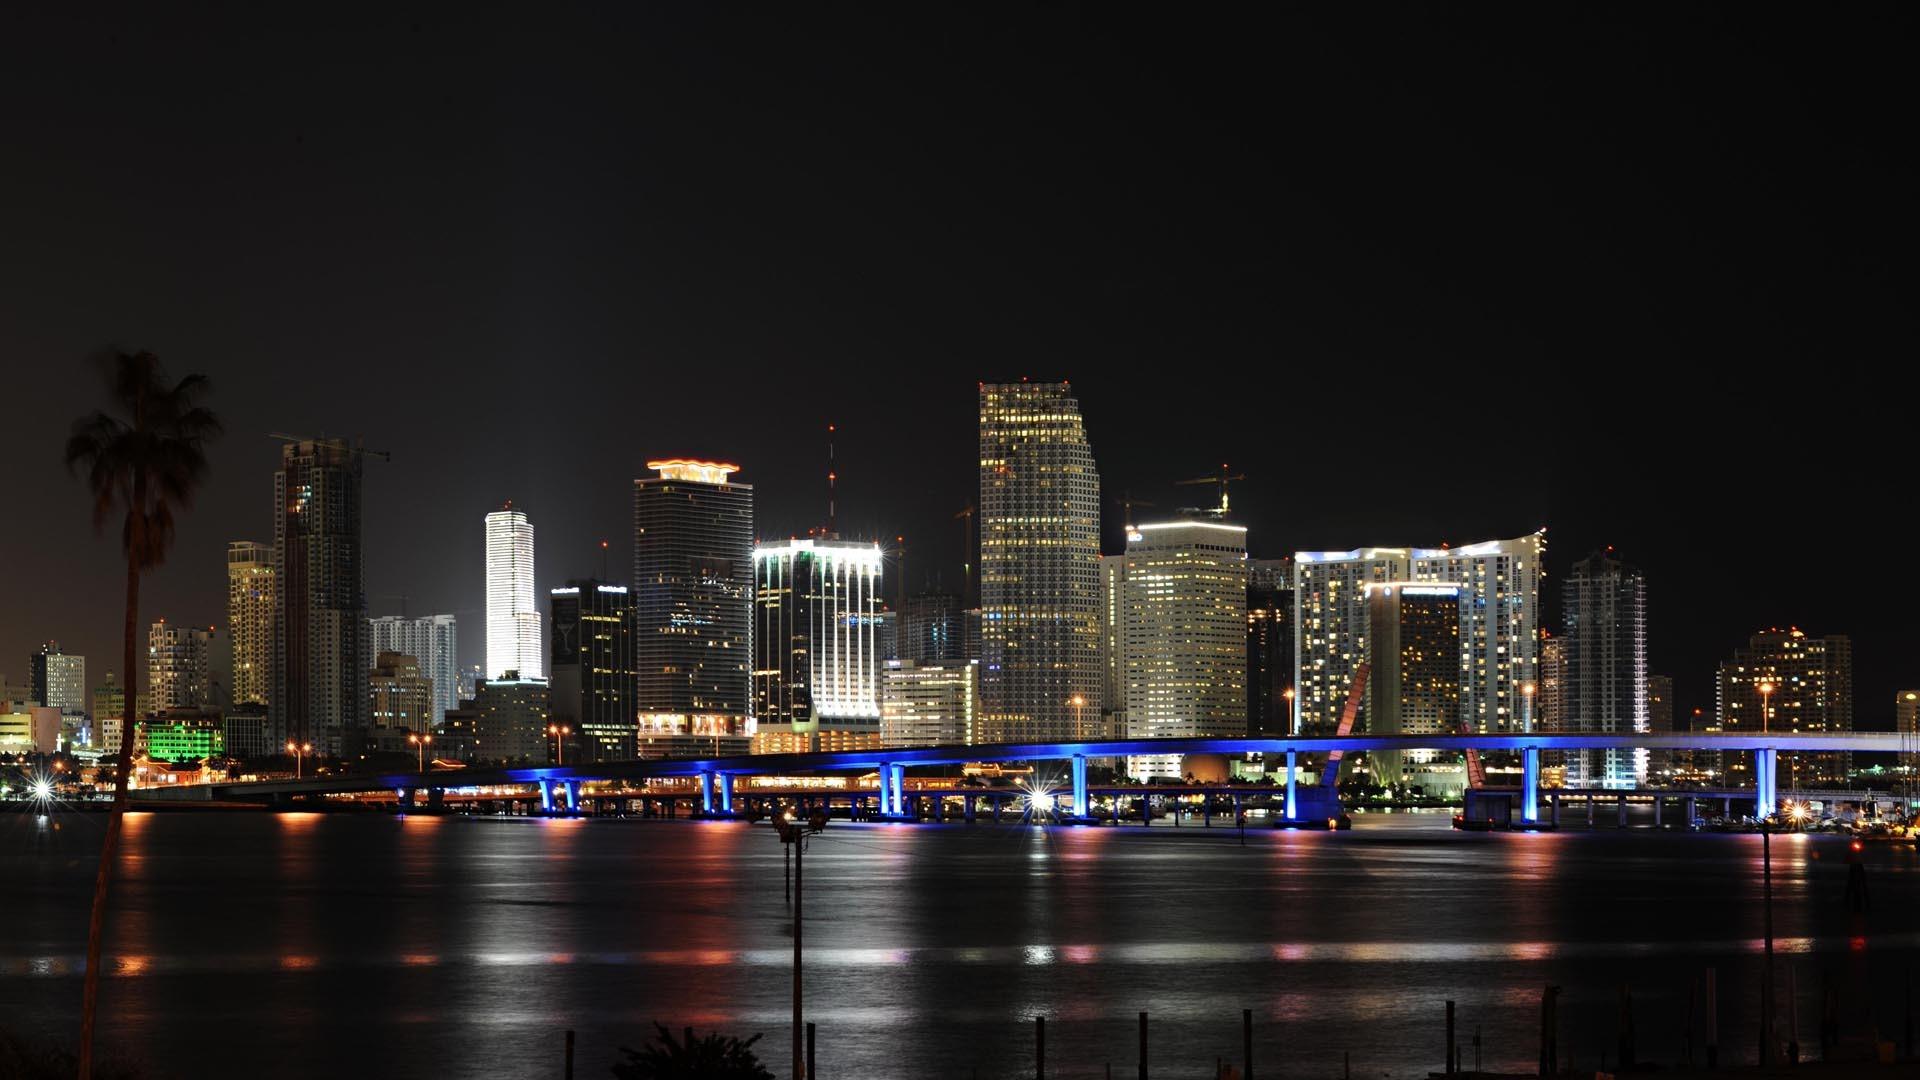 Miami Florida HD Wallpaper 1920x1080 1920x1080